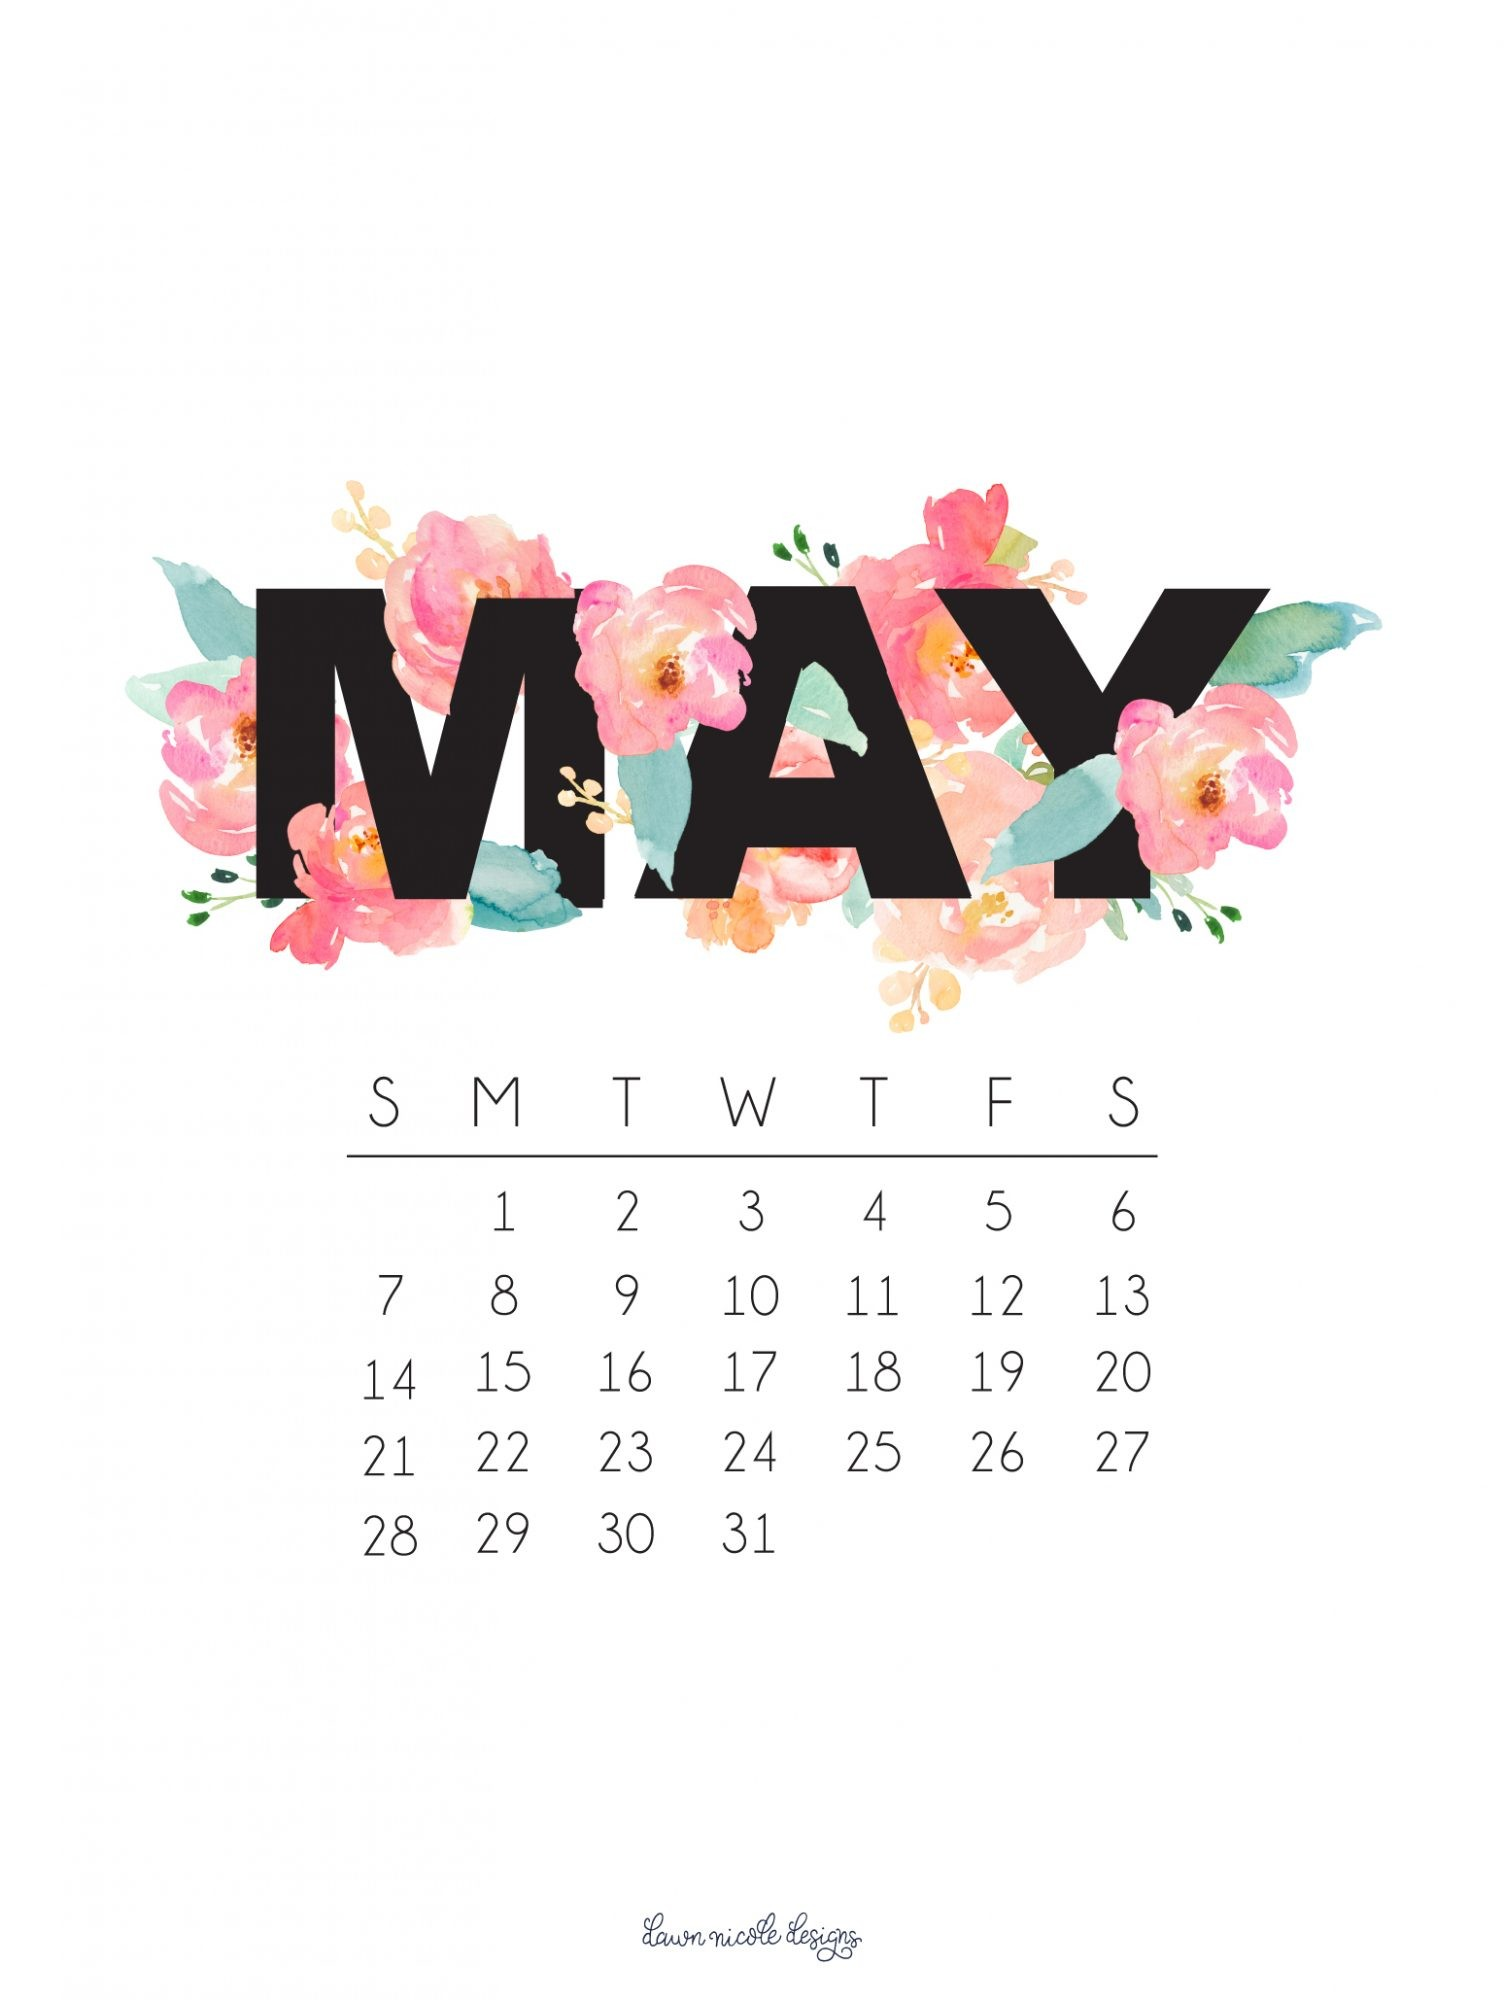 Calendar wallpaper hd for pc : Desktop wallpapers calendar april ·①